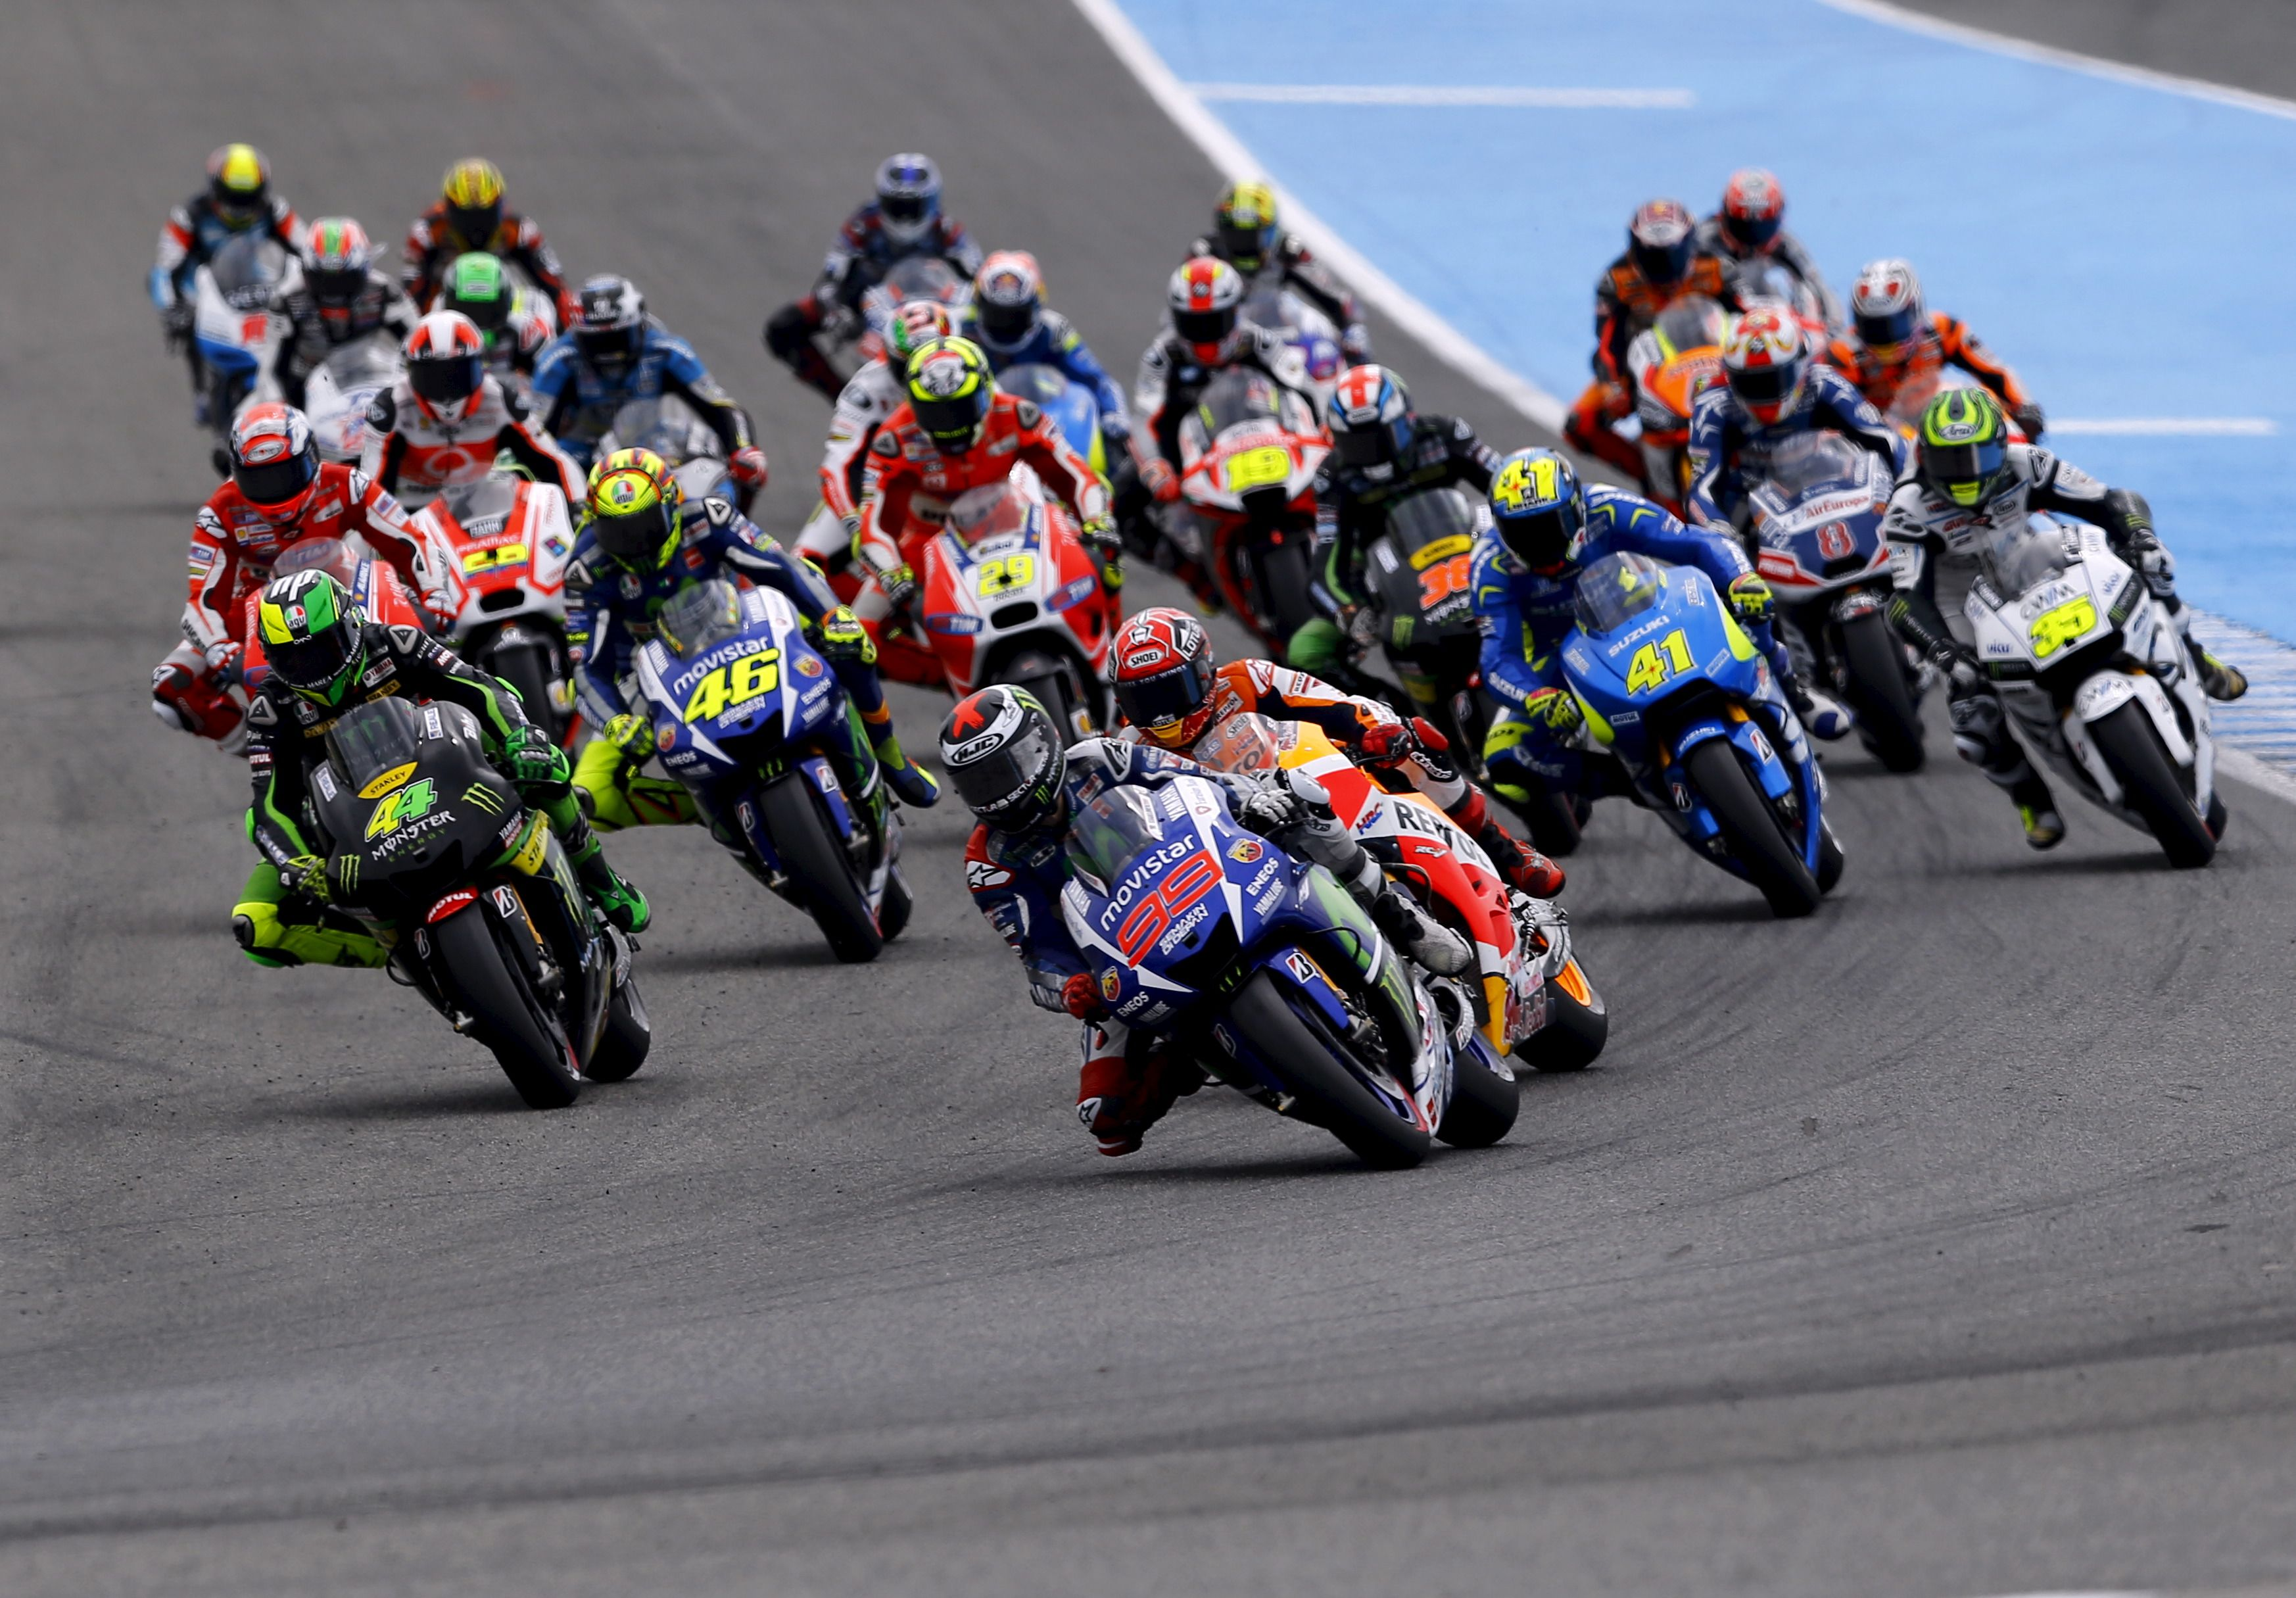 Czech Republic Grand Prixb Sun, Aug 21 Live motogp online